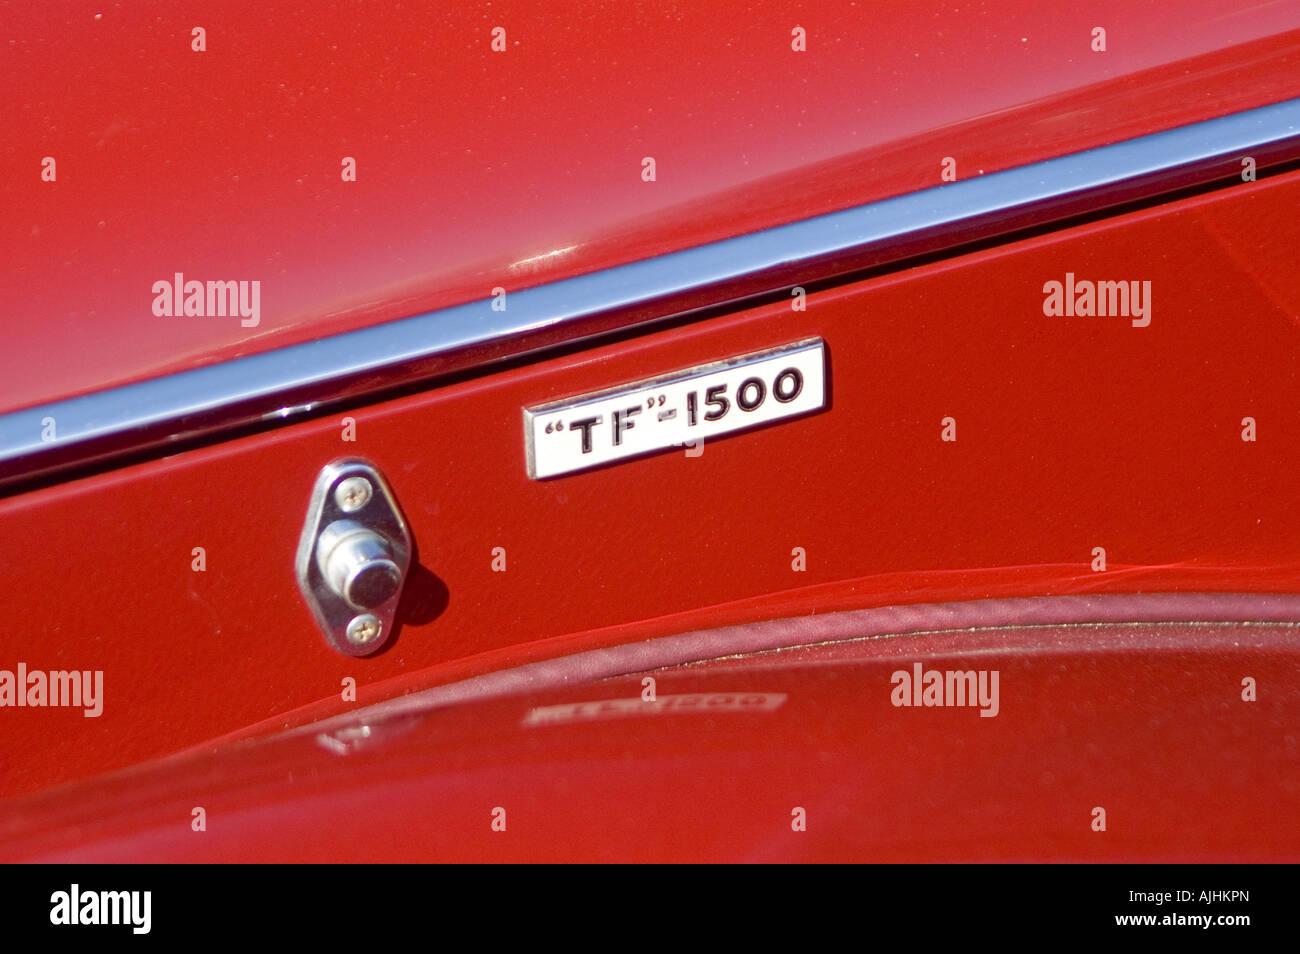 Mg tf 1500 vintage sports car detail badge stock photo royalty mg tf 1500 vintage sports car detail badge vanachro Images